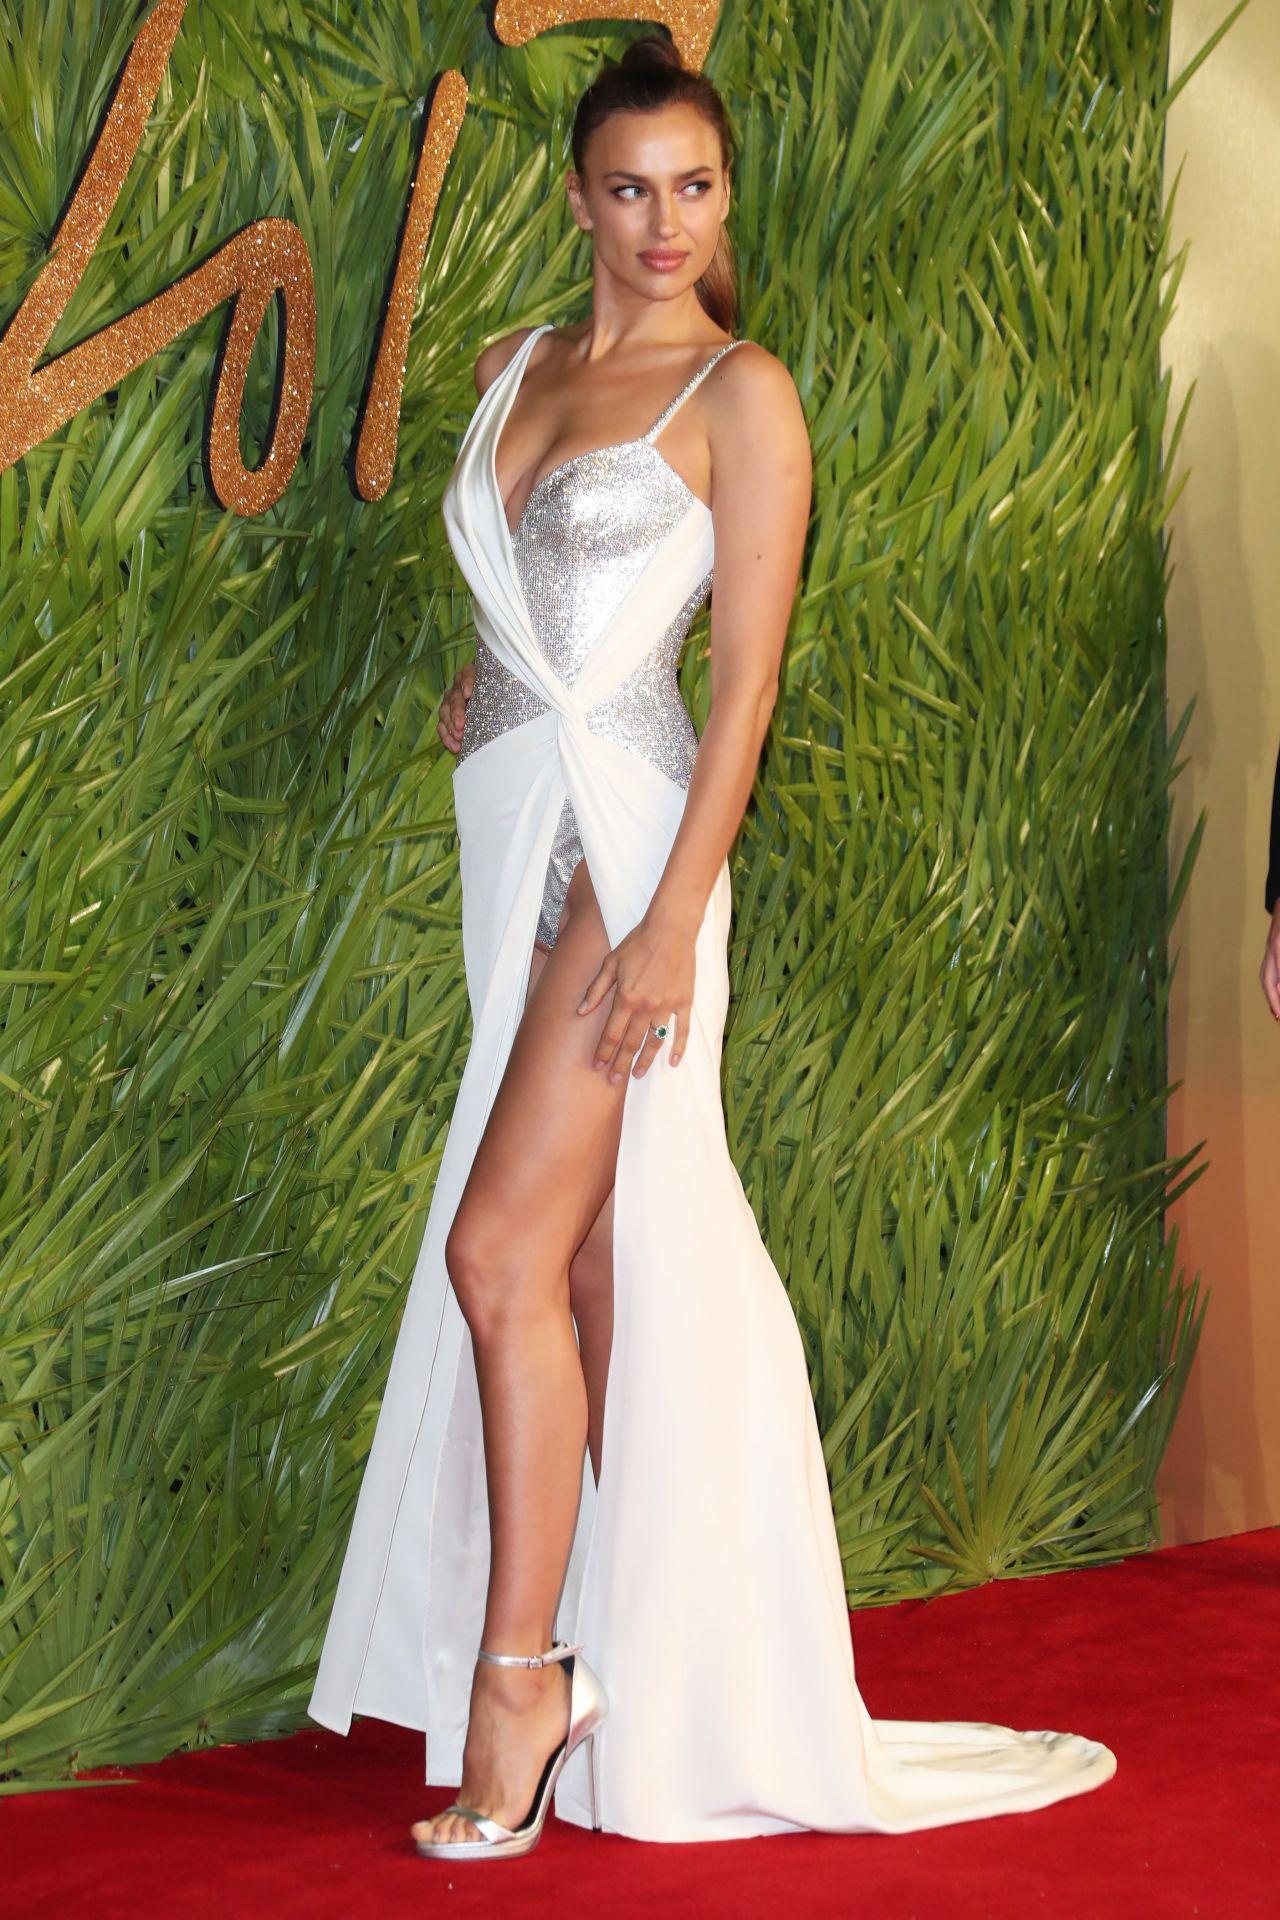 Alexandra Michelle Rodriguez nudes (51 photos) Cleavage, 2020, bra